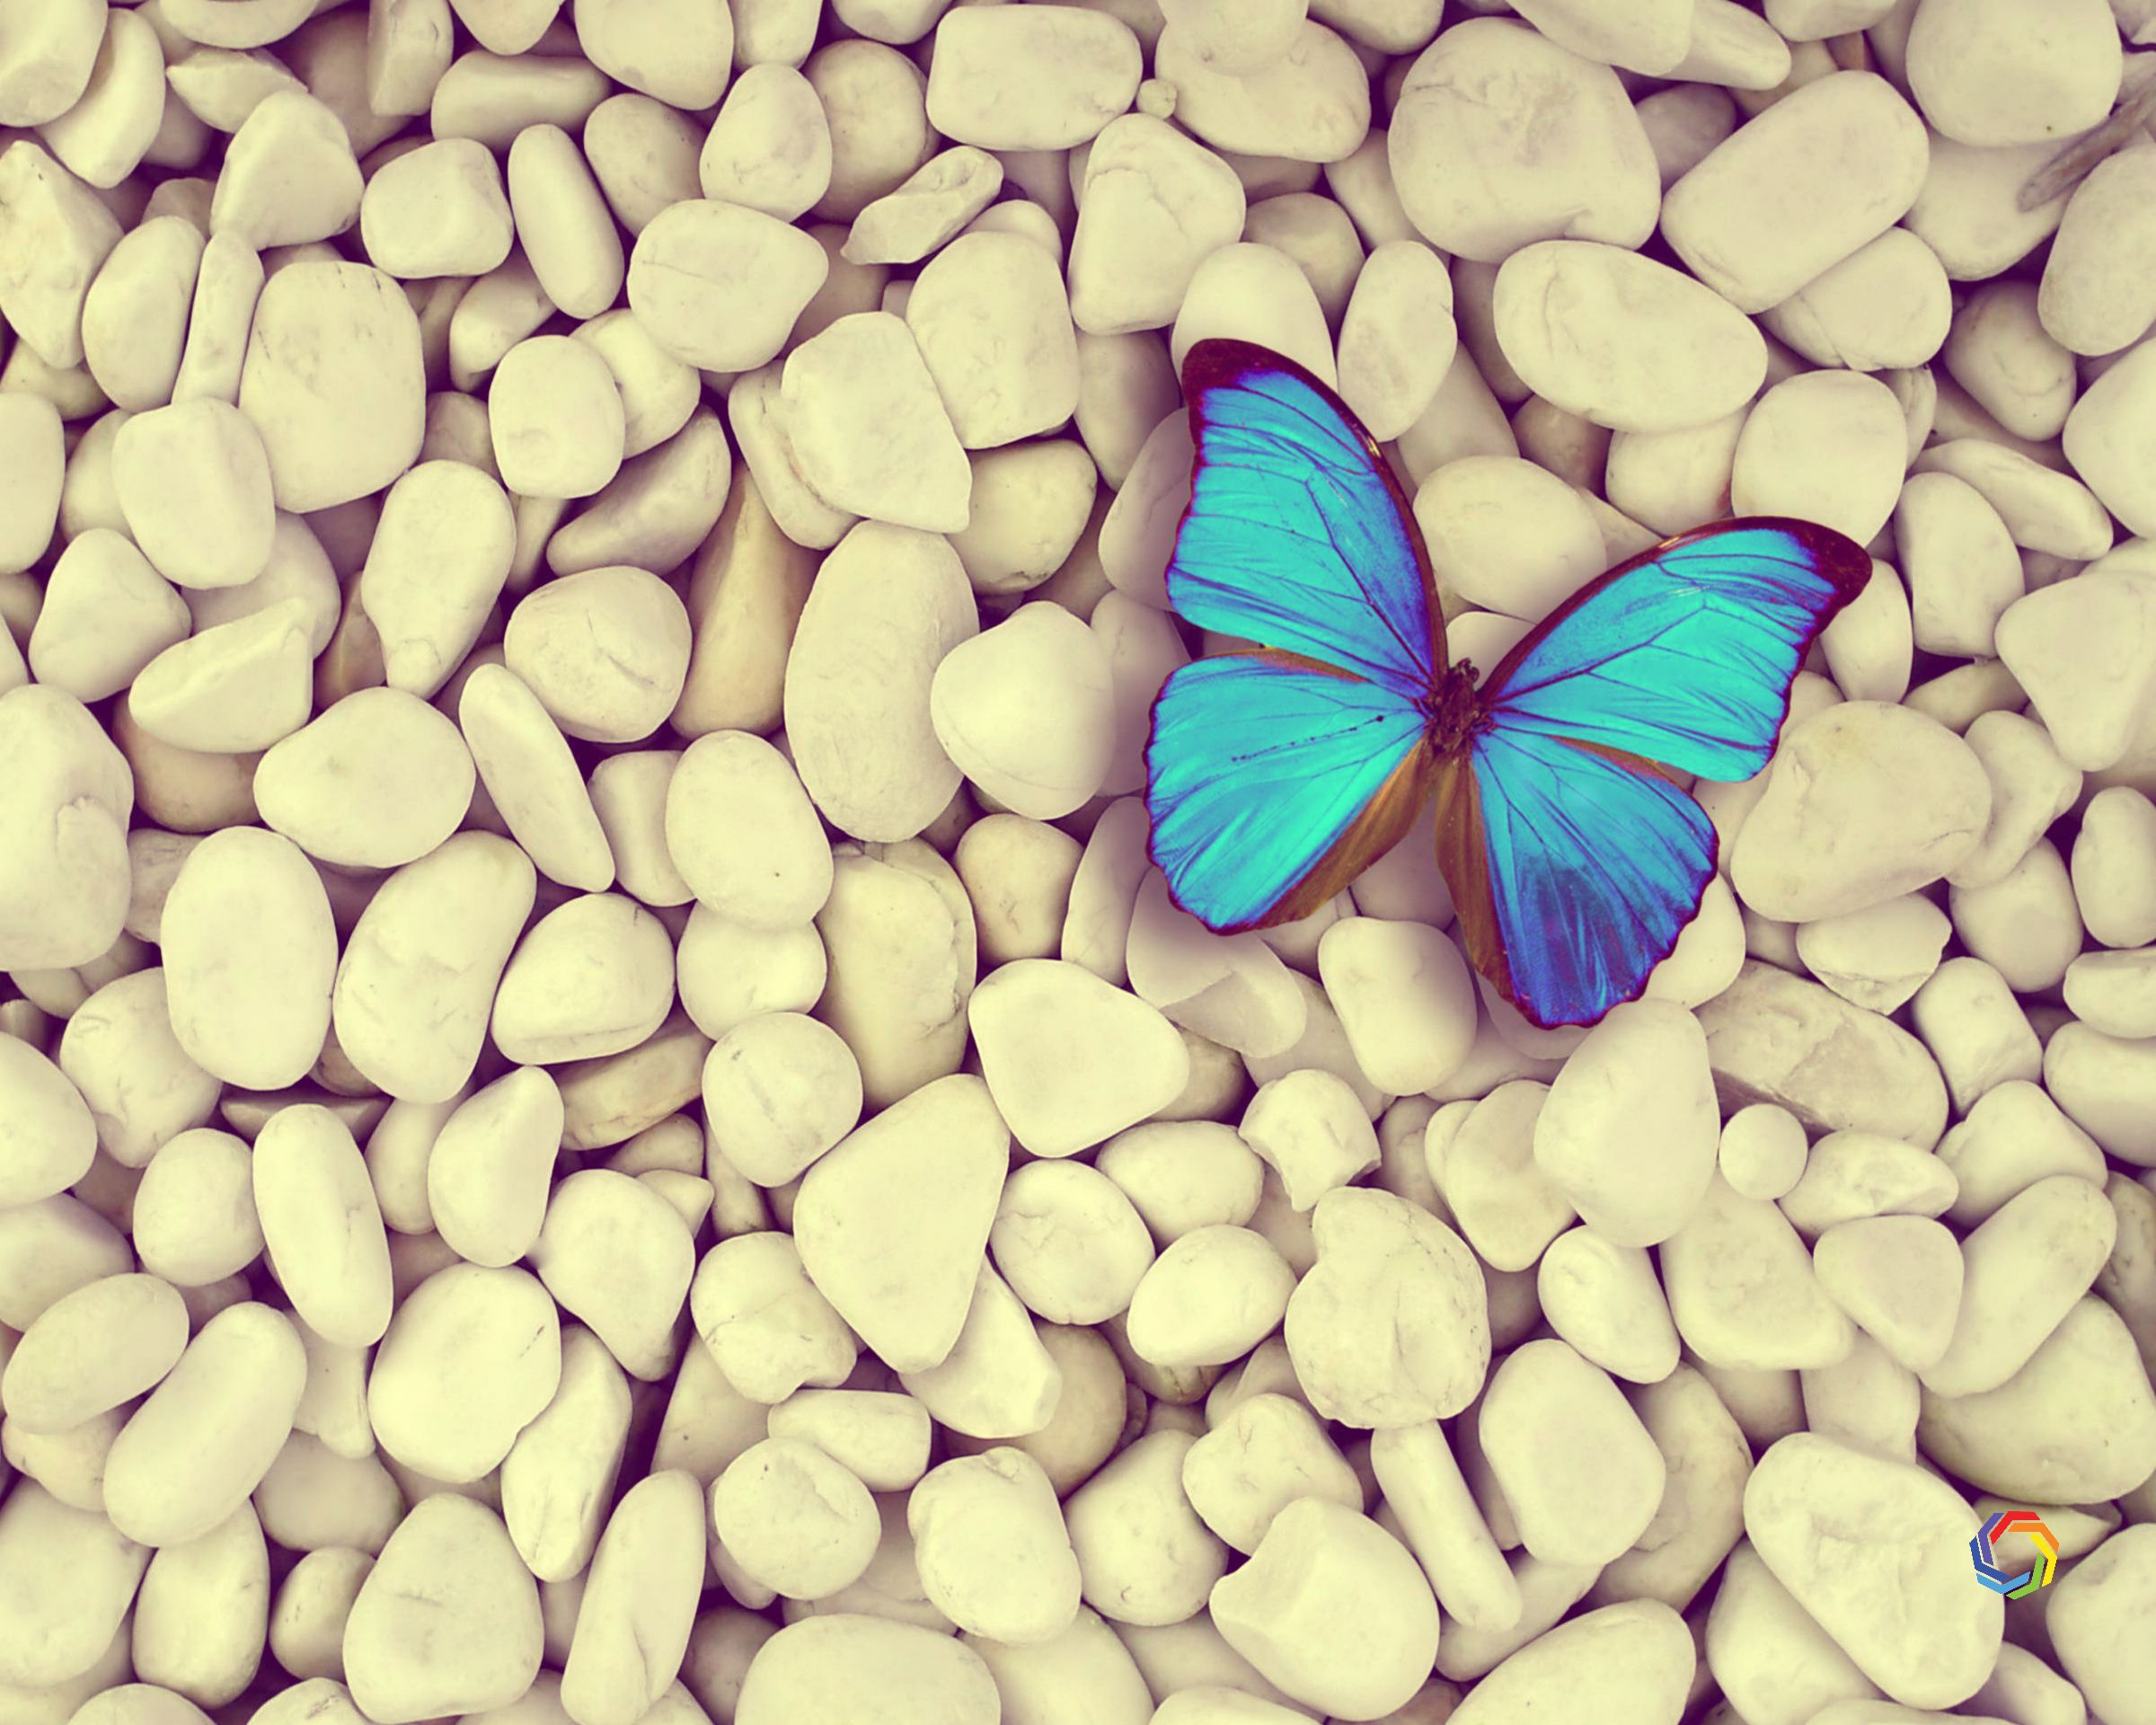 Download Desktop Blue Butterfly Free Hd Wallpaper Hd Widescreen Wallpaper Or High Definition Widescreen Wallpape Free Hd Wallpapers Blue Butterfly Hd Wallpaper